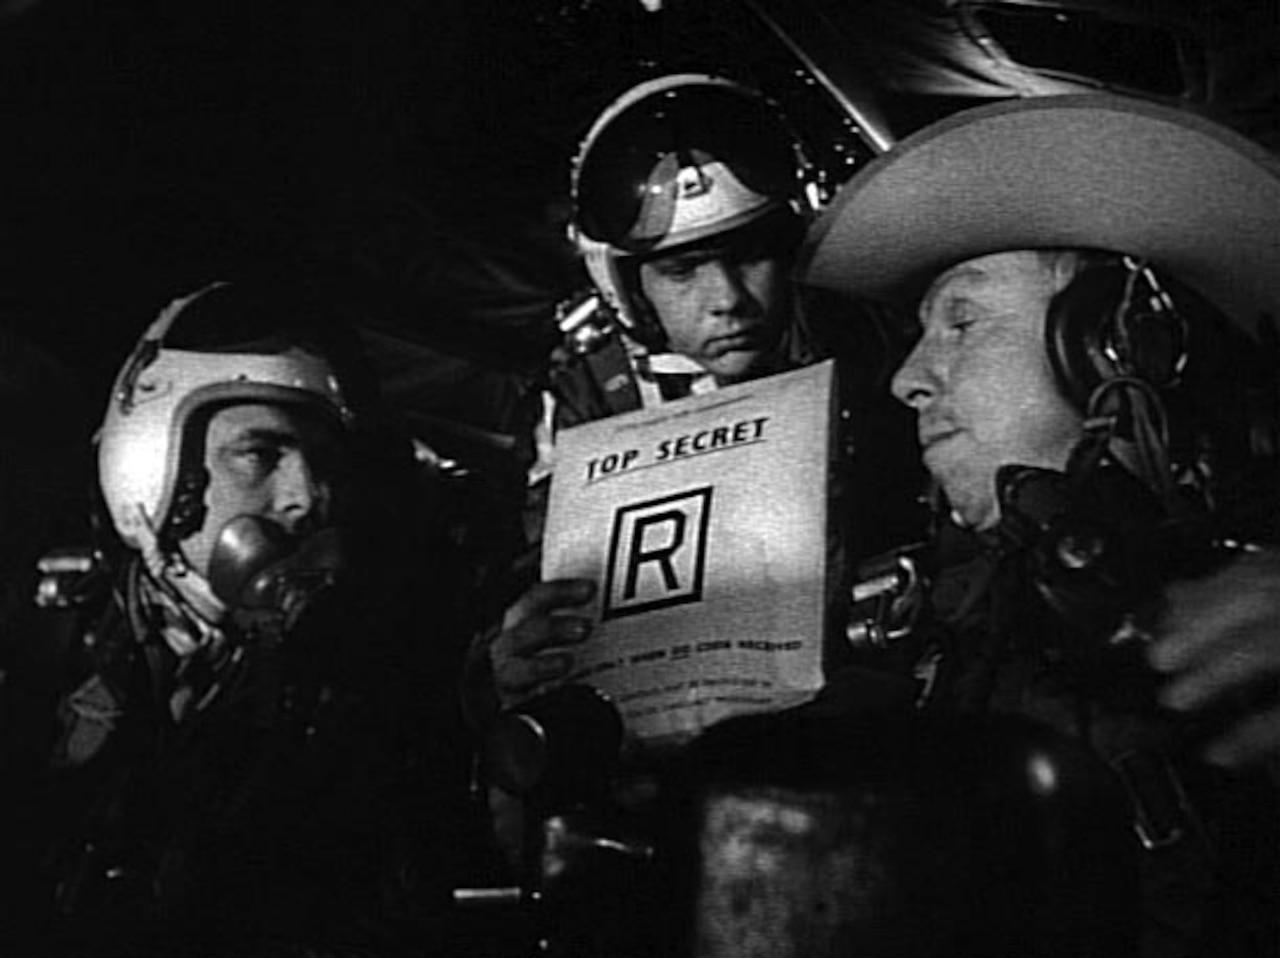 Men dressed as military members talk on a movie set.